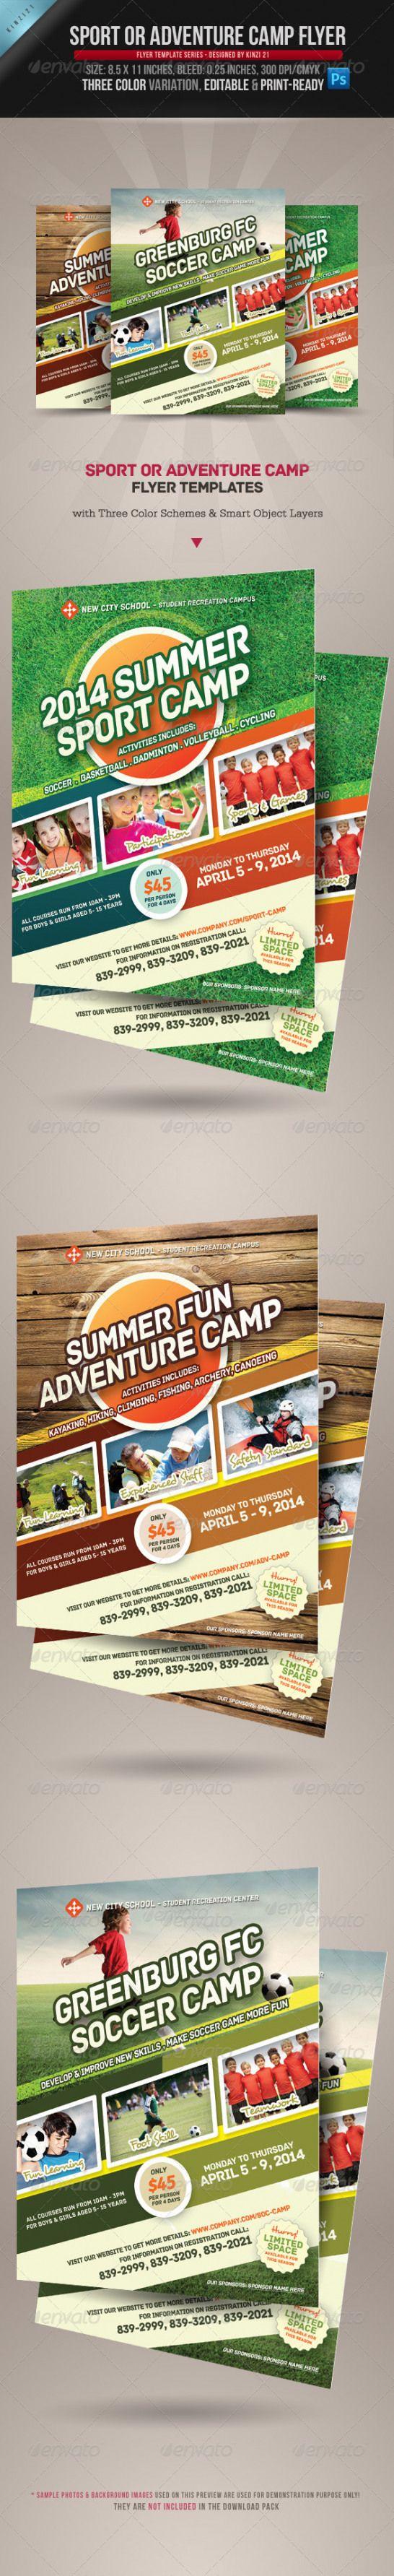 Sport Or Adventure Camp Flyers Multi Sportevent Multi Sport Event Flyer Adventure Camping Multi Sport Event